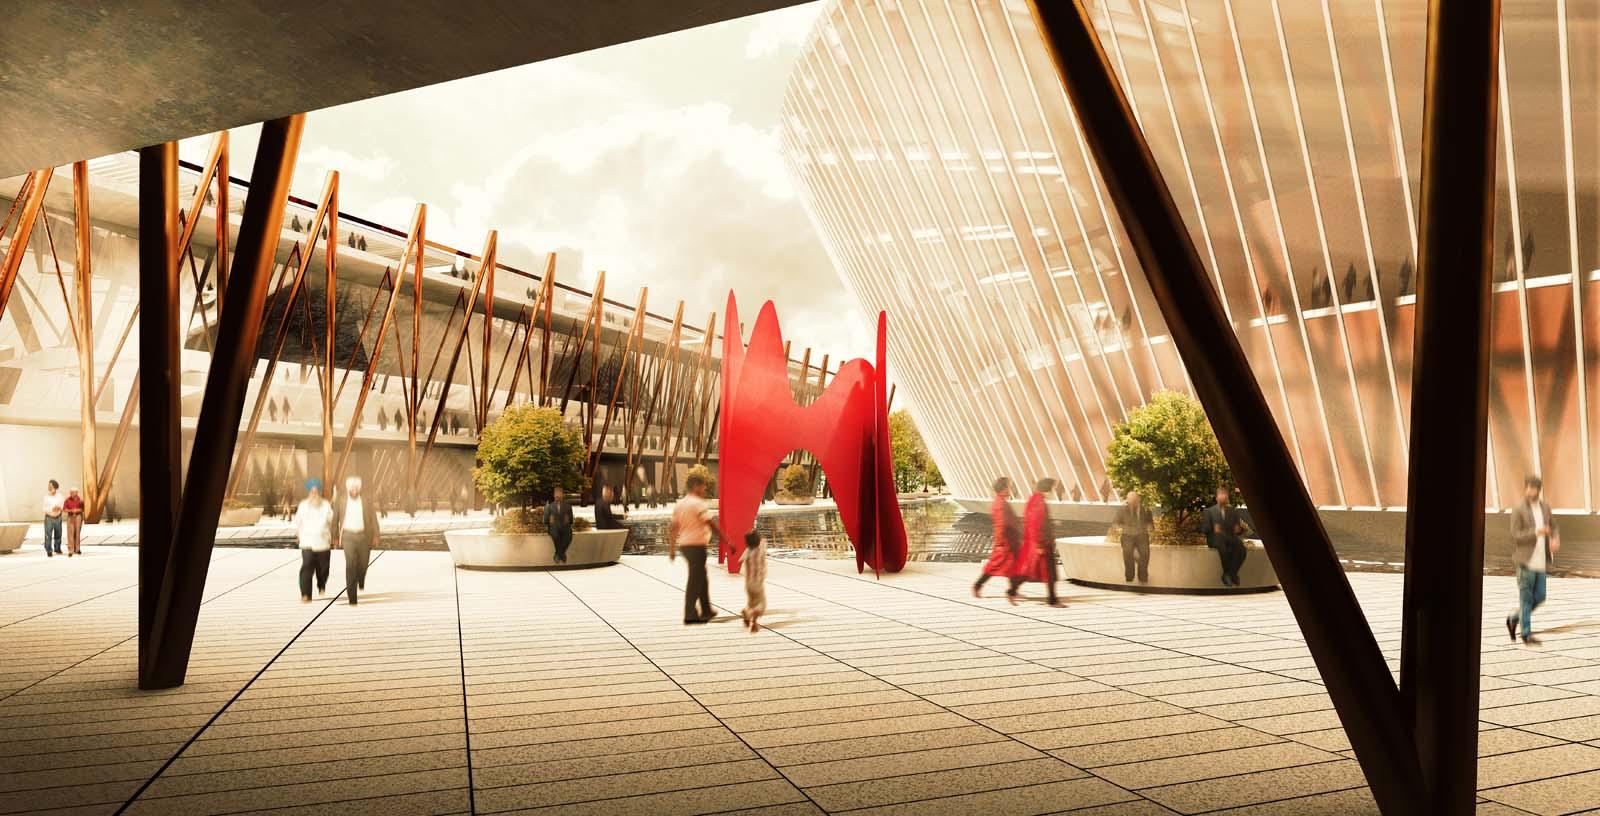 Mohali_Convention_Centre_03_Architecture_Idom_computer_graphic_GLT